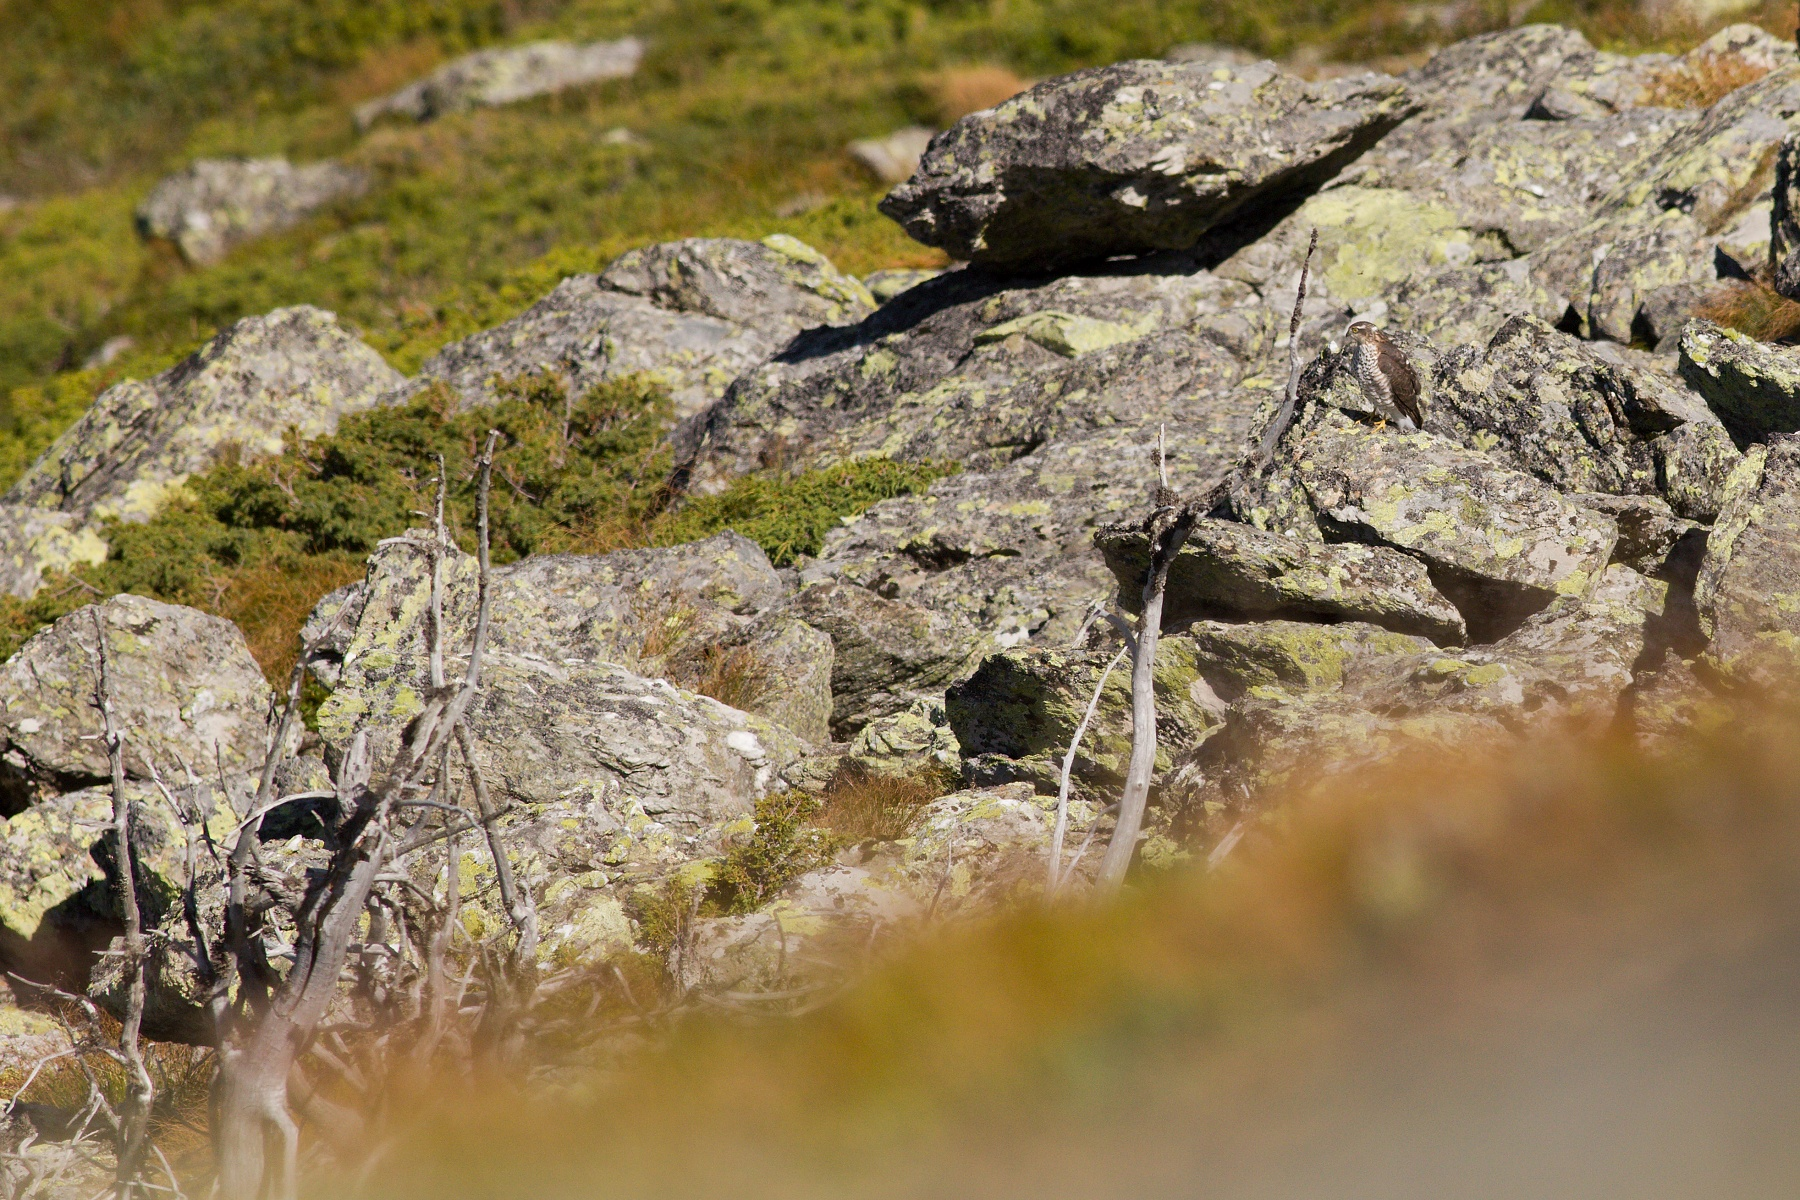 jastrab krahulec (Accipiter nisus) Eurasian sparrowhawk, Boia Mică, Munții Făgăraș, Romania Canon EOS 6D mark II, Canon 400 mm f5.6 L USM, f7.1, 1/3200, ISO 640, 10. august 2019